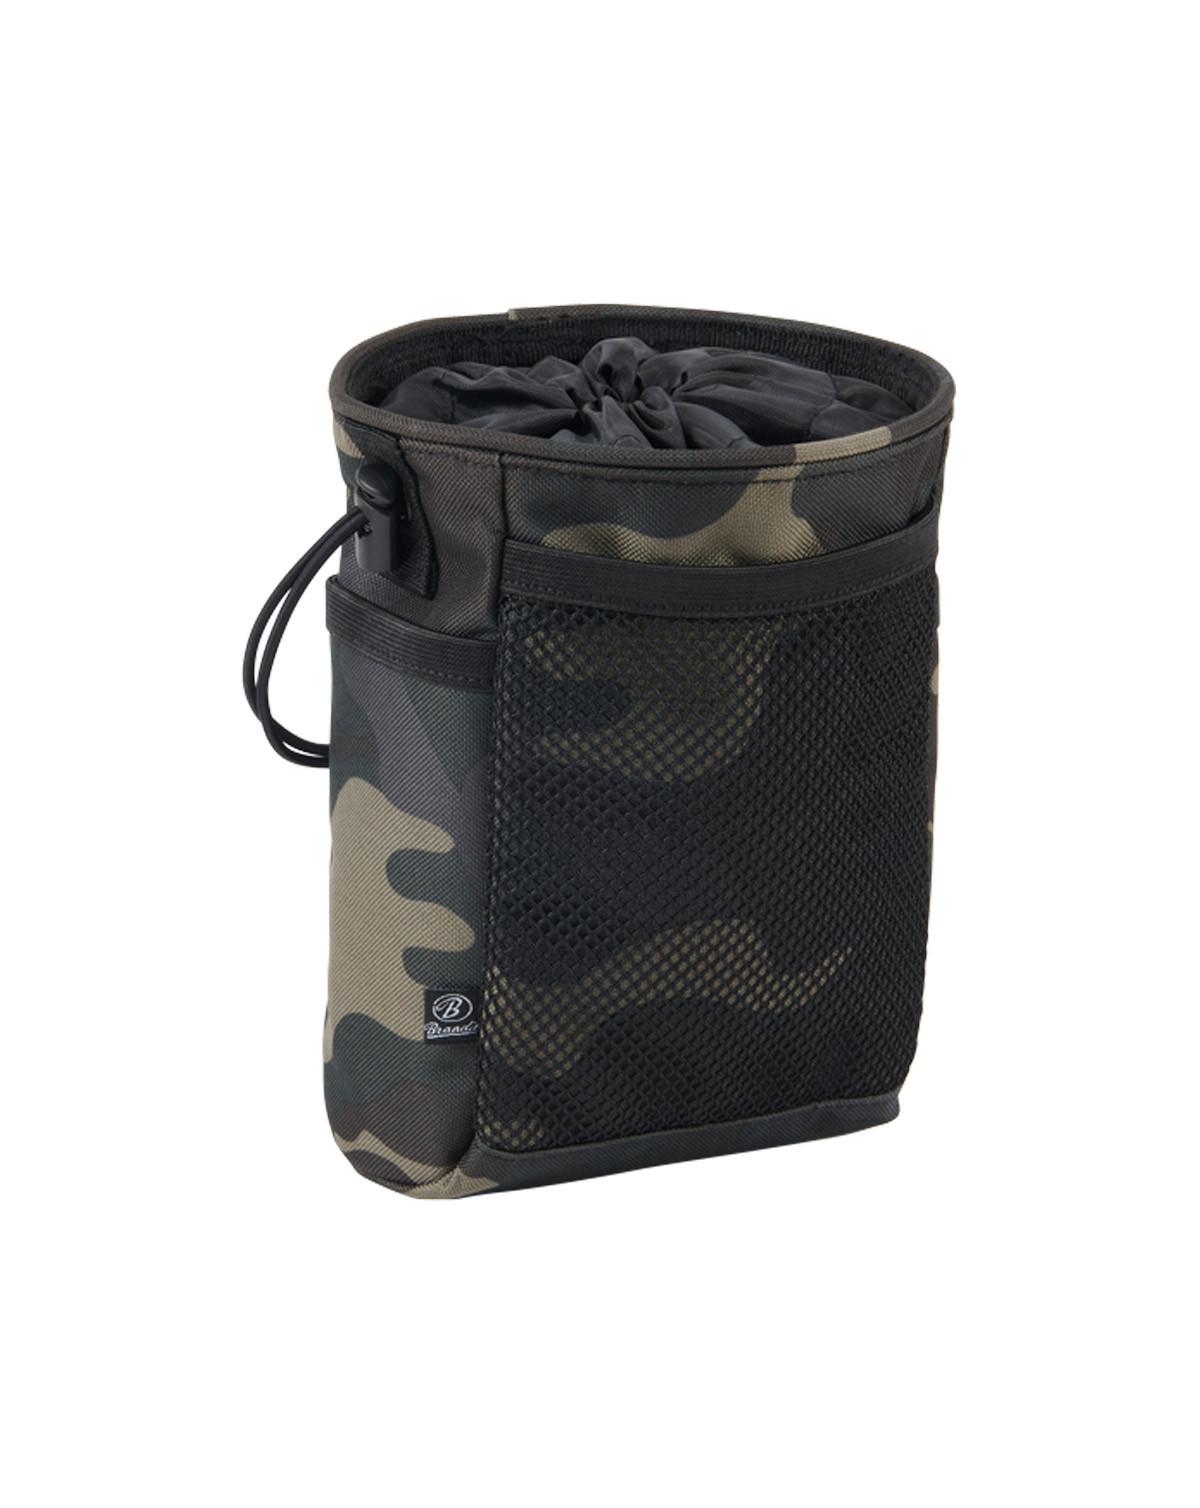 Image of   Brandit Dump Pouch MOLLE-Kompatibel (Dark Camo, One Size)